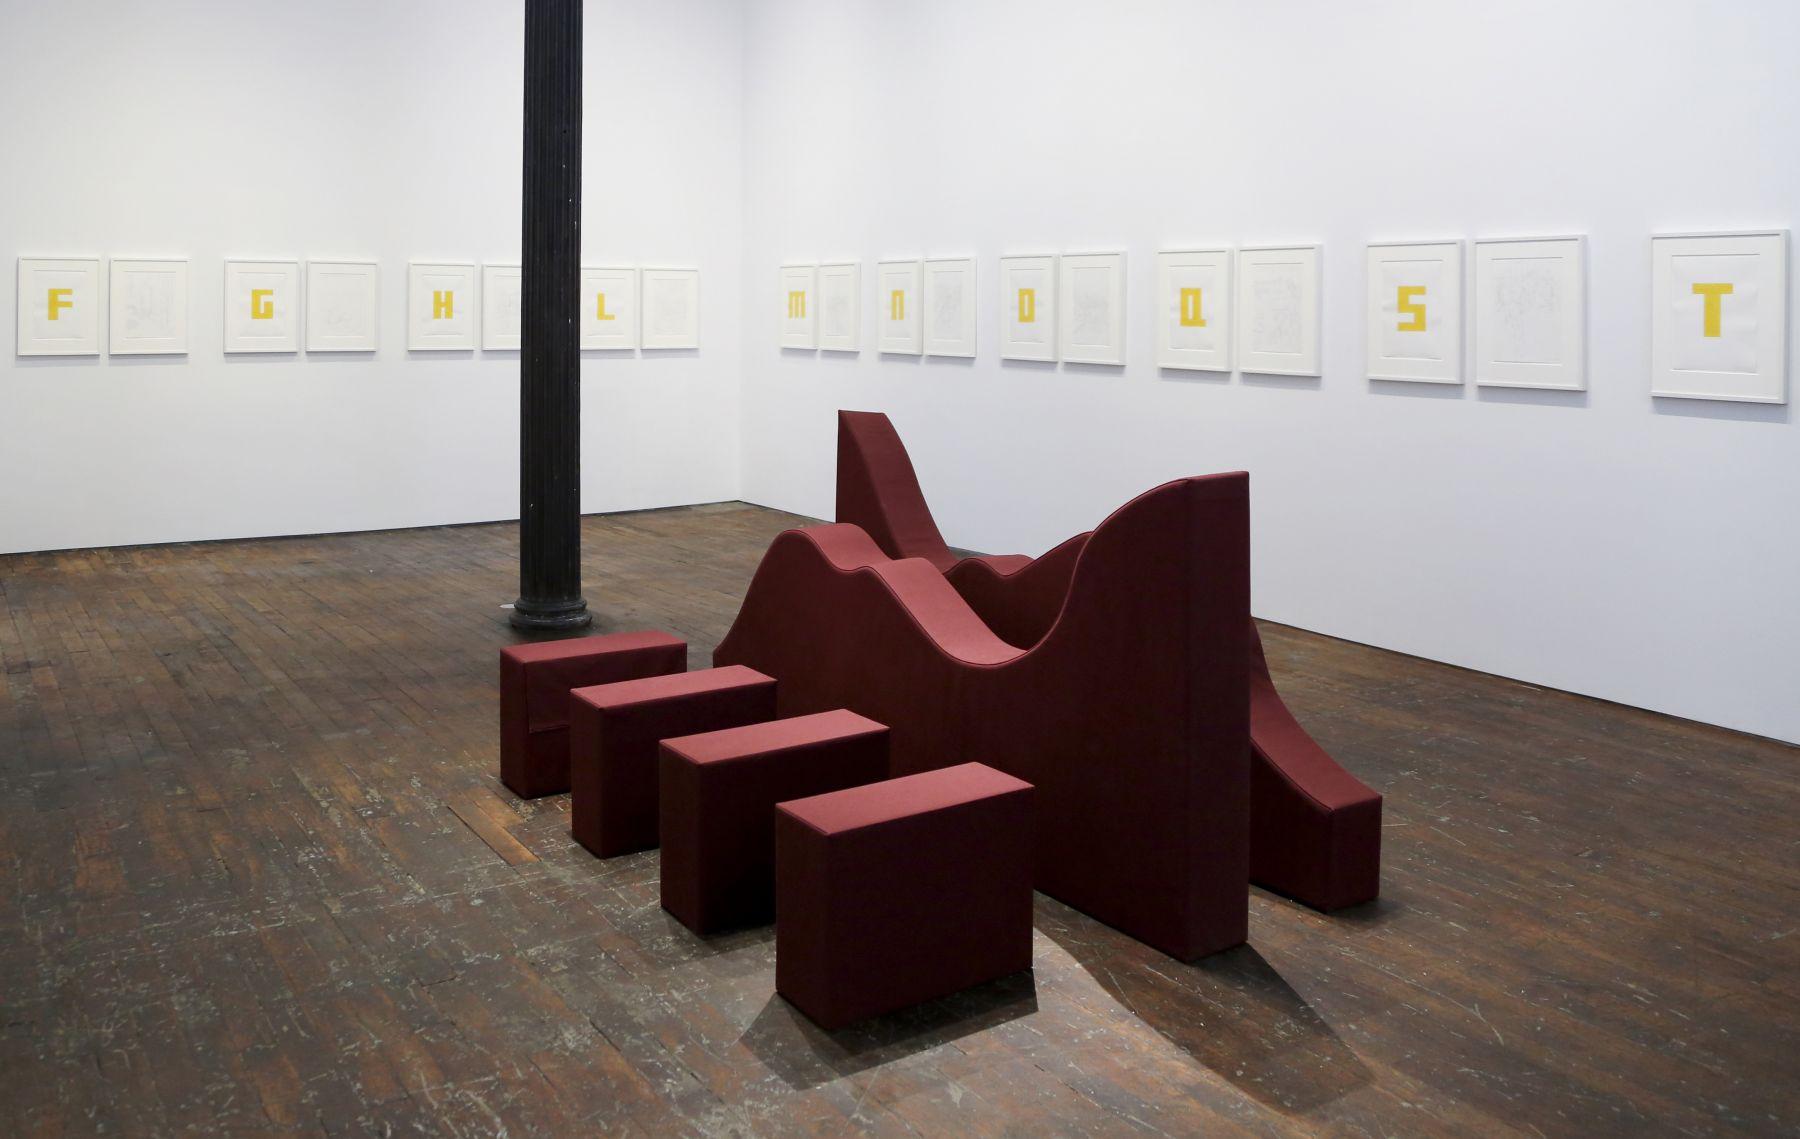 Franz Erhard Walther – installation view 1